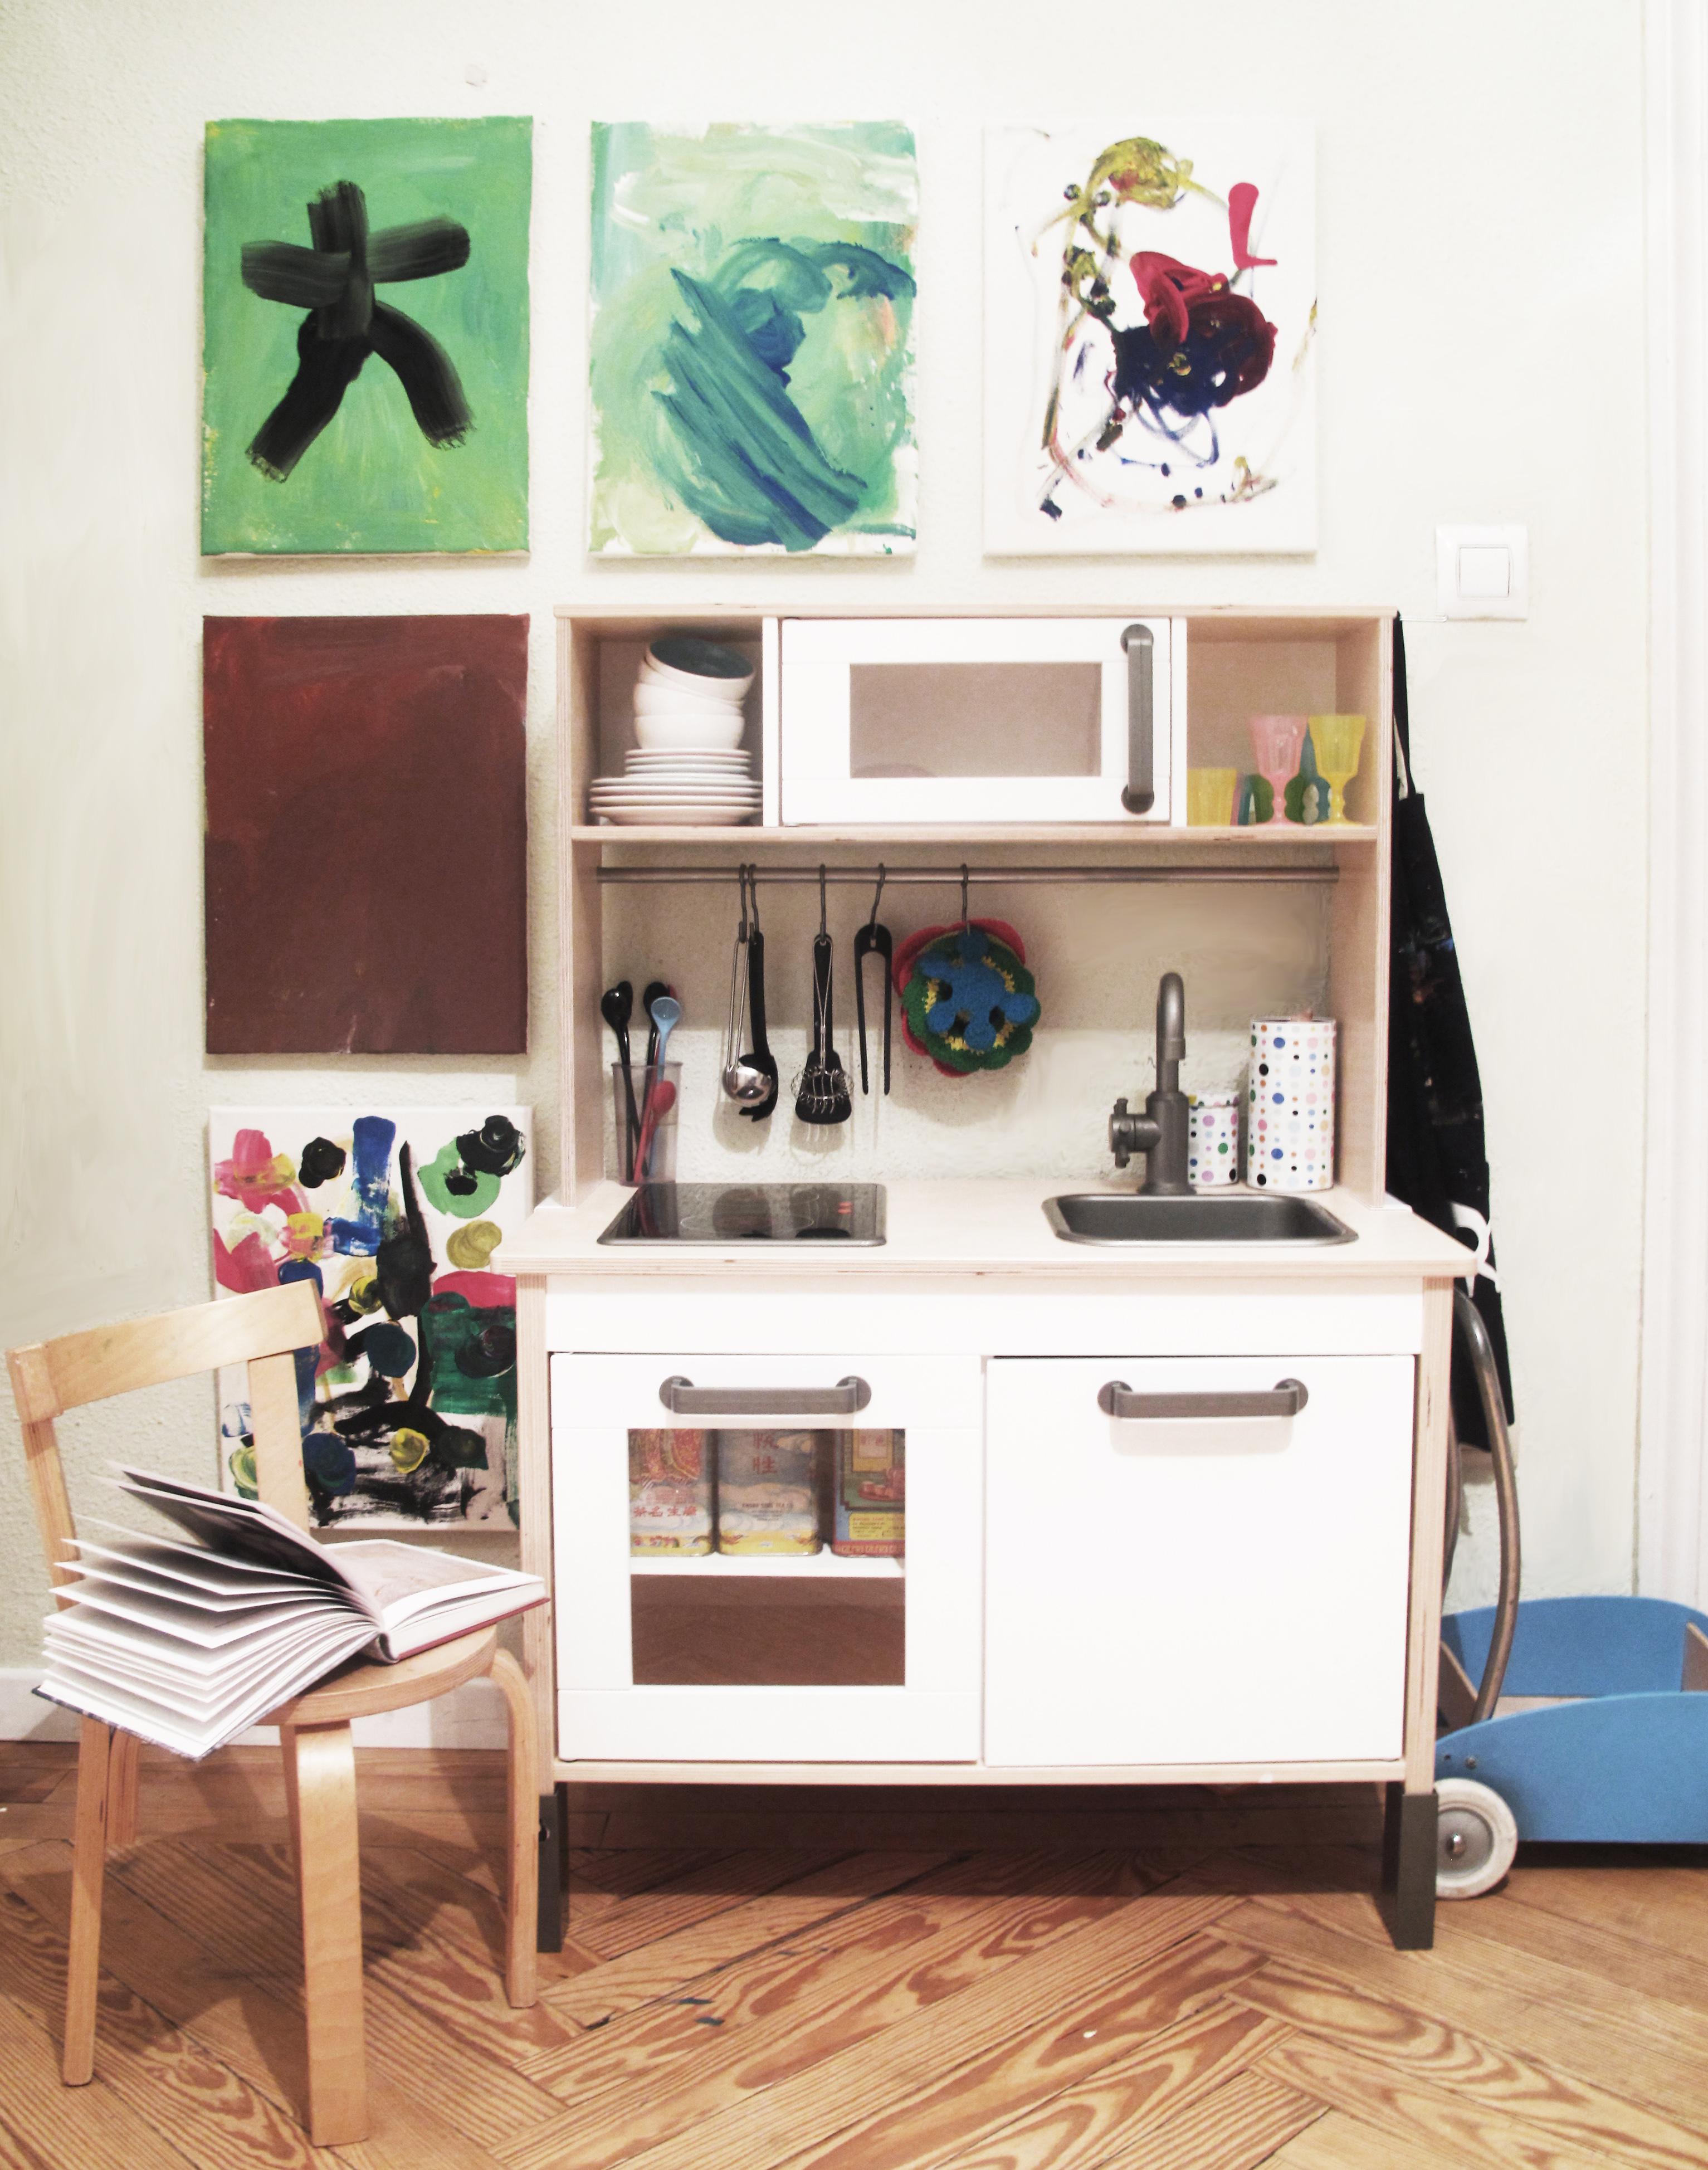 Cocina ikea ni os images for Ikea almacenamiento ninos